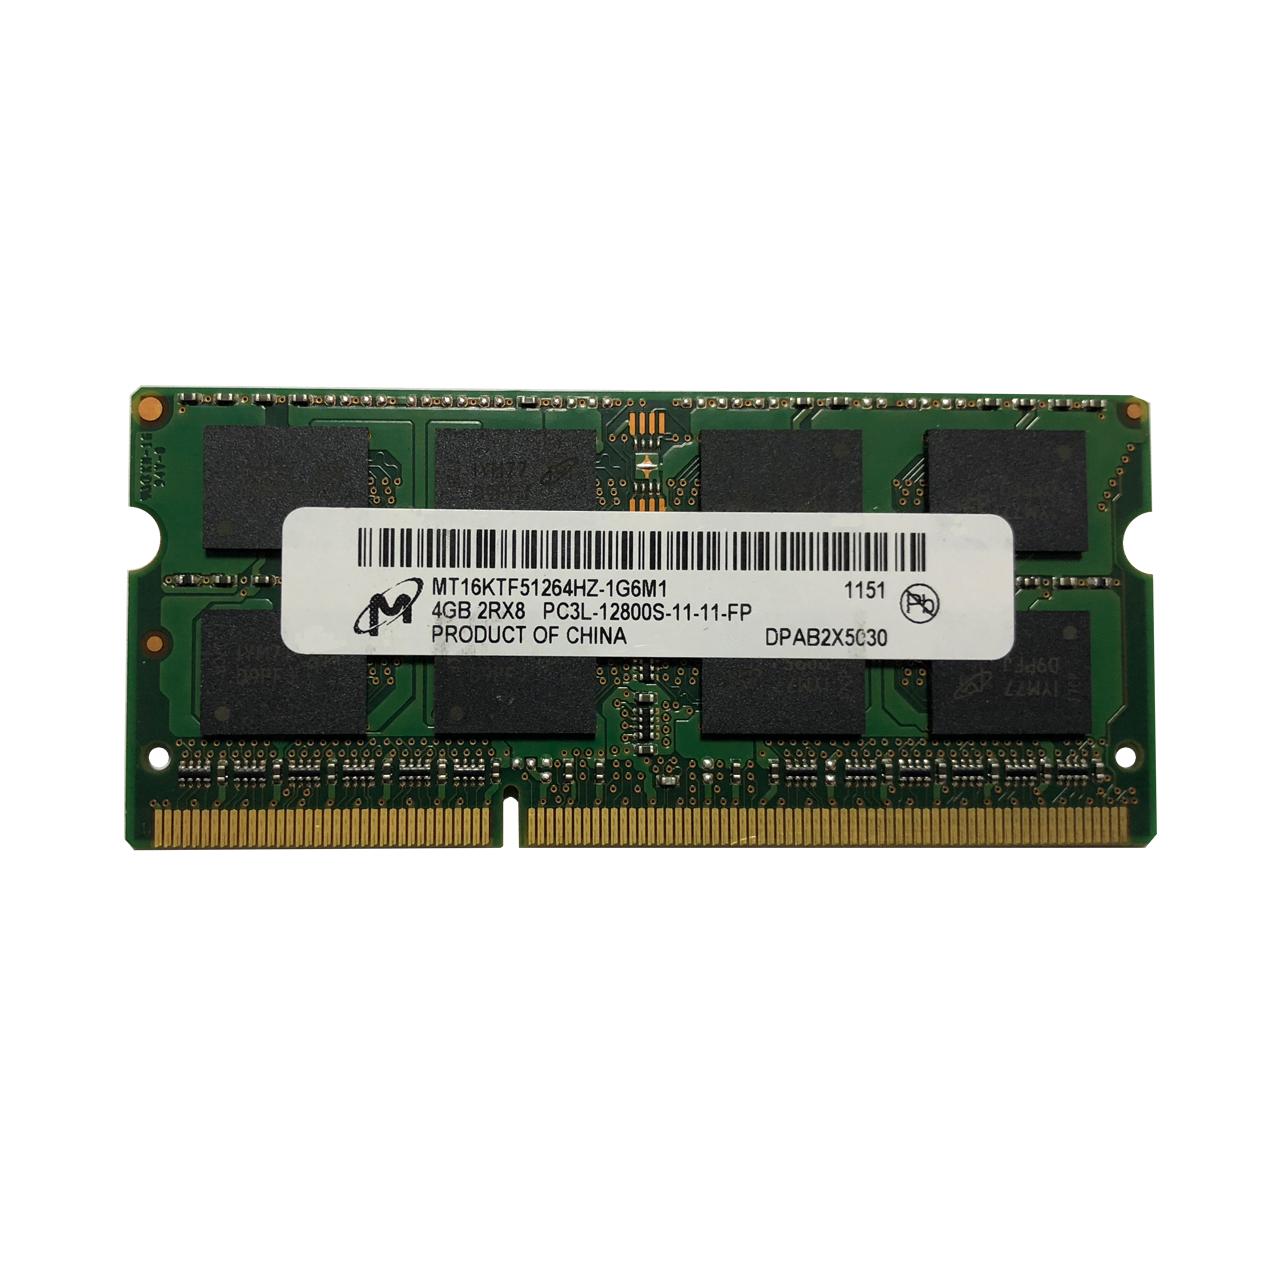 رم لپ تاپ میکرون مدل 12800 DDR3lL PC3L 1600MHz ظرفیت 4 گیگابایت